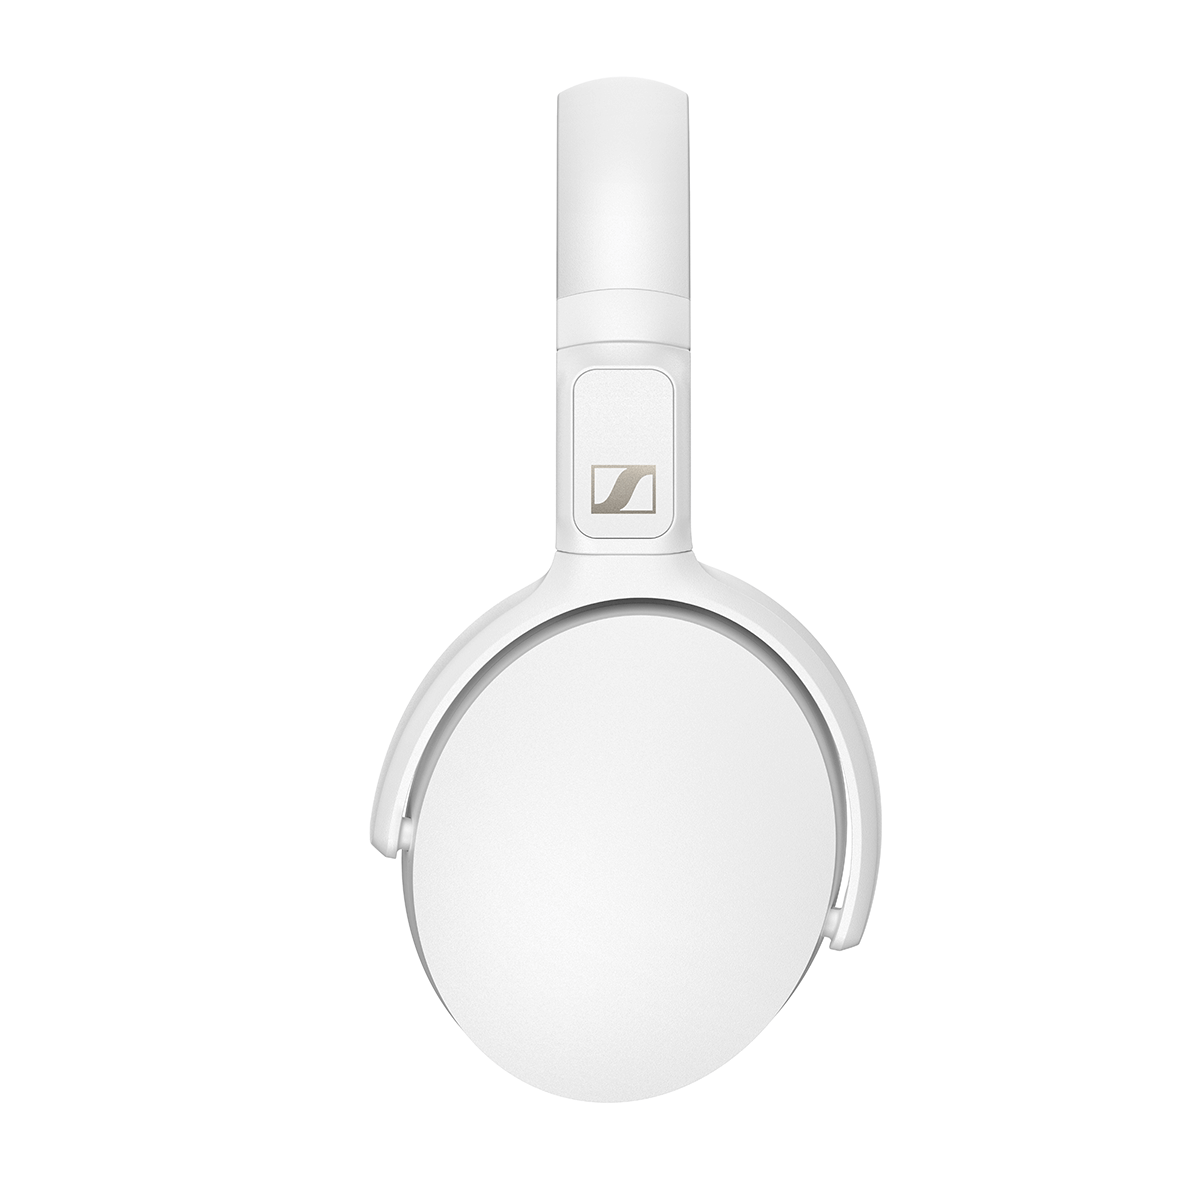 Sennheiser HD 350 BT White